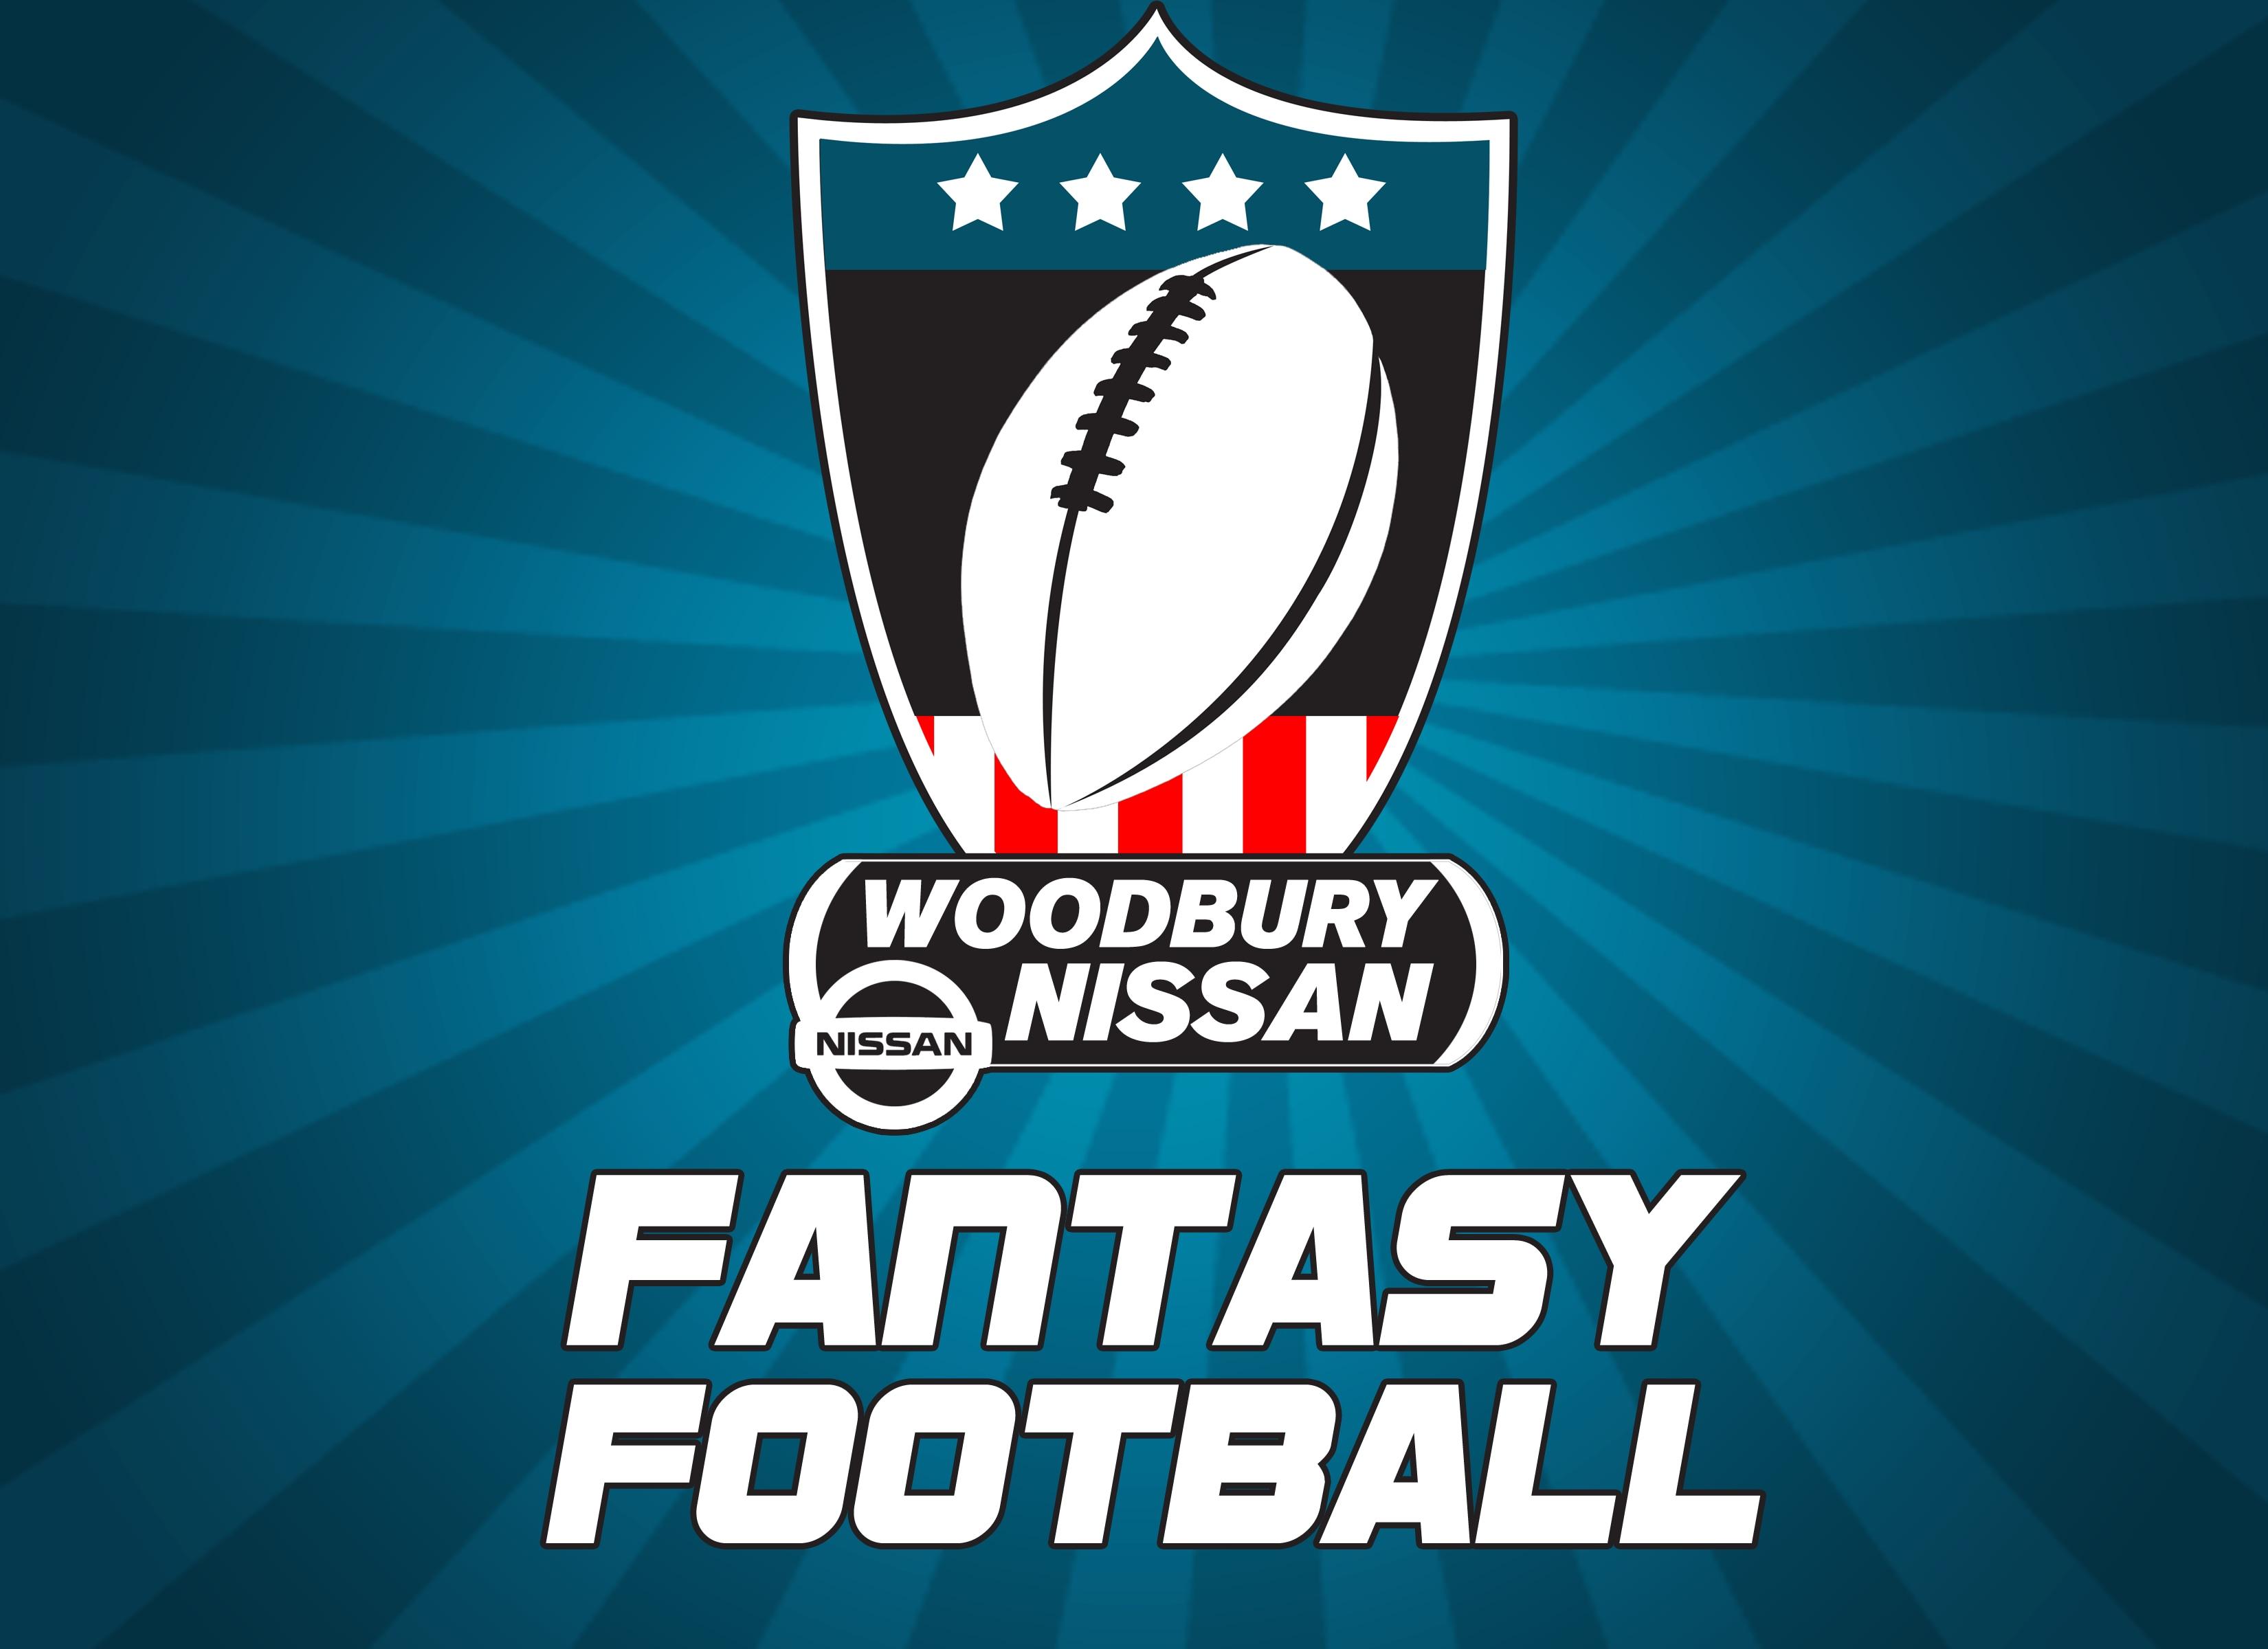 Woodbury nissan fantasy football 2013